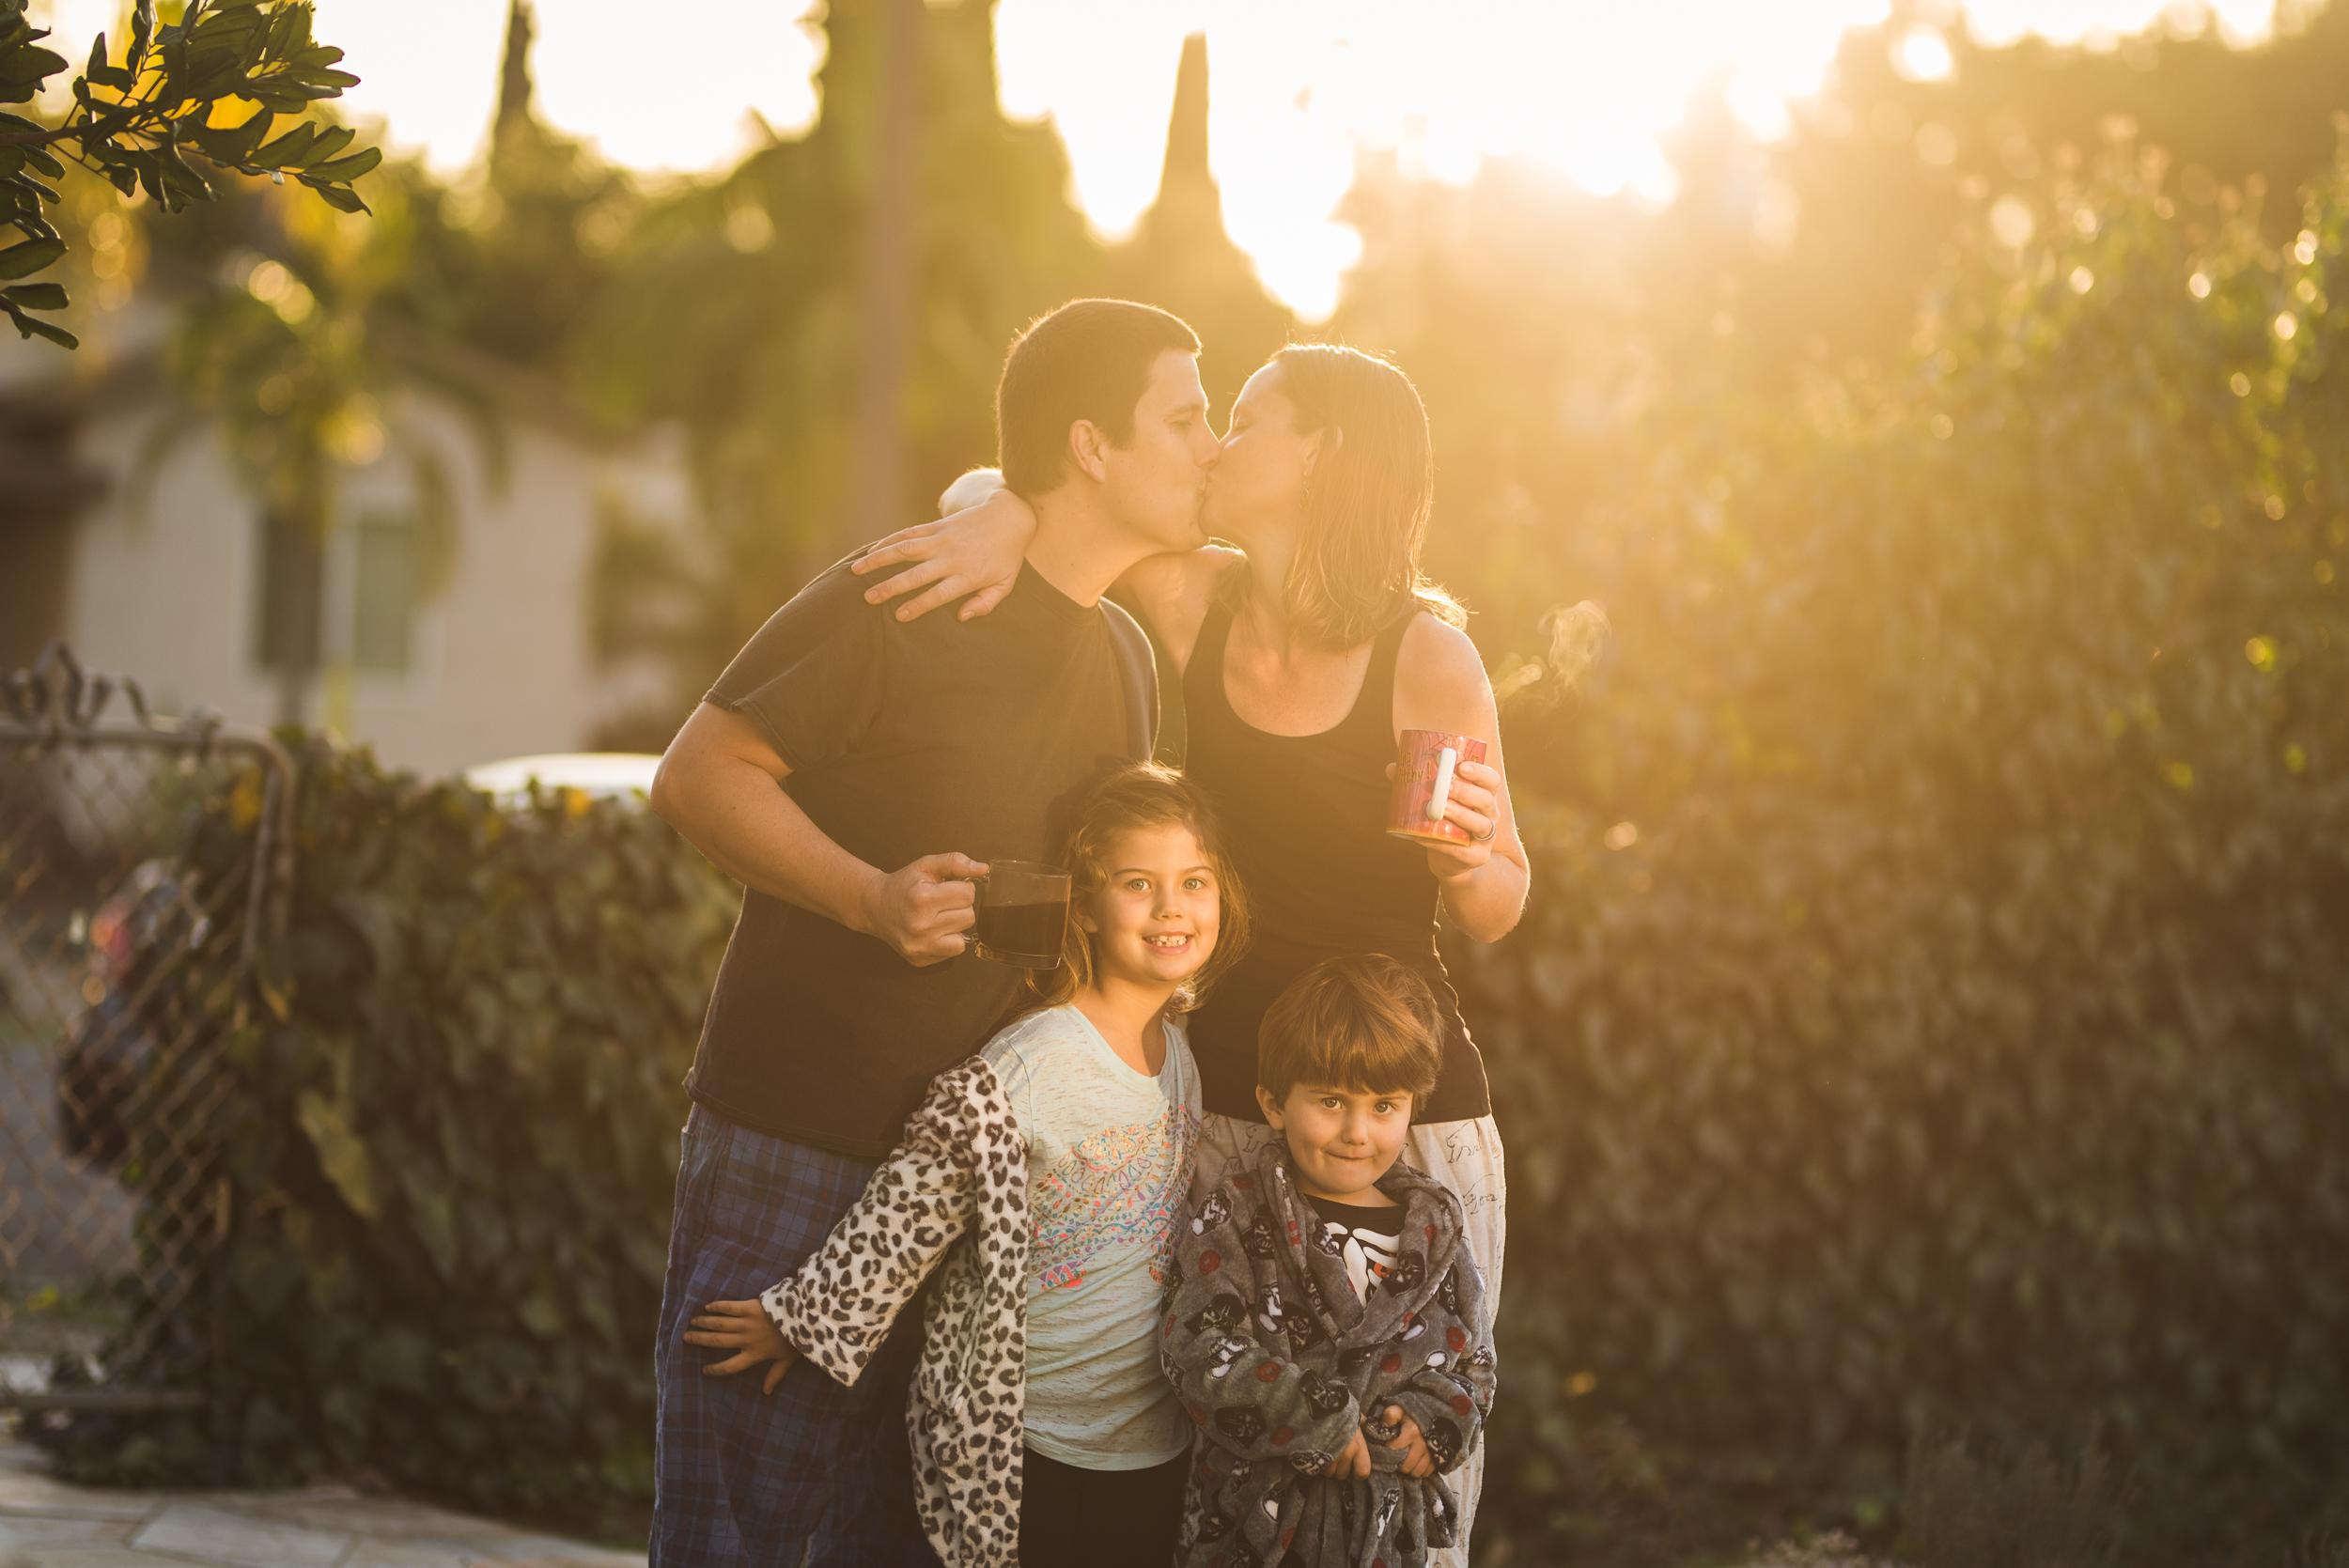 2018-San-Diego-Family-Lifestyle-Newborn-Travel-Vacation-Photographer-Kelsey-Smith-Photography-Coronado-La-Jolla-Encinitas-Solana-Beach-Del-Mar-266.jpg